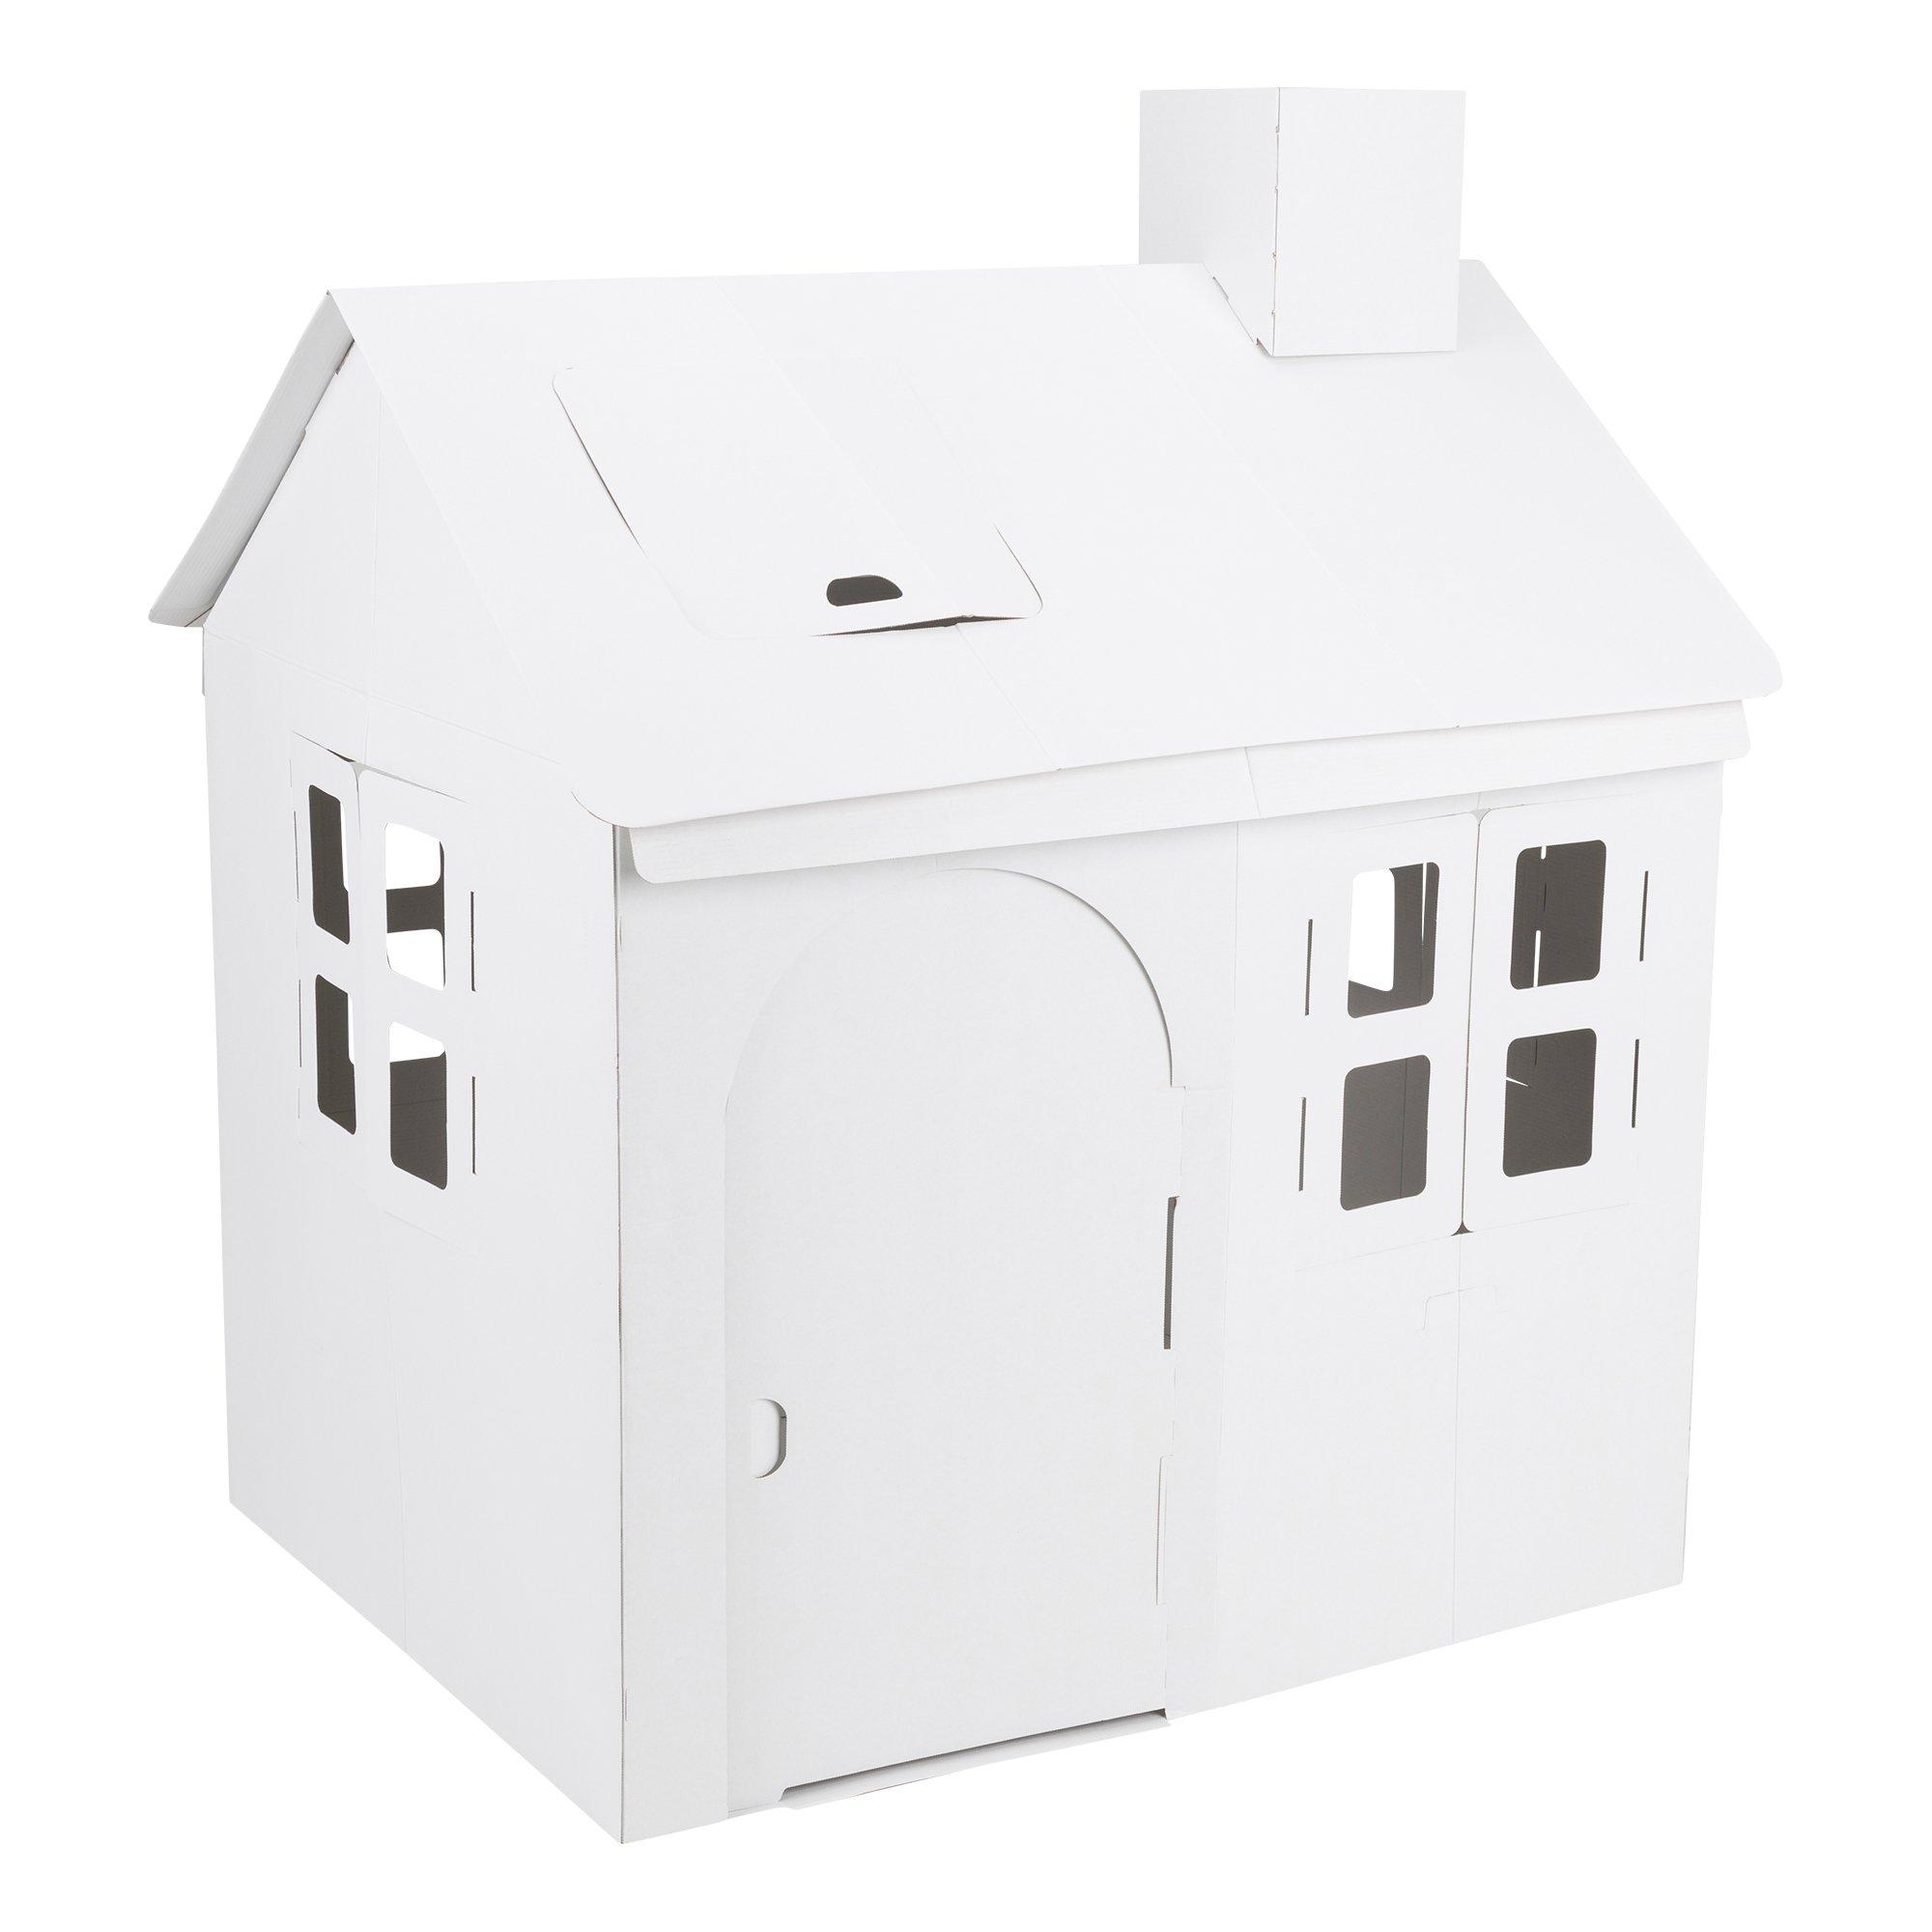 Cheap Cardboard Playhouse, find Cardboard Playhouse deals on ...